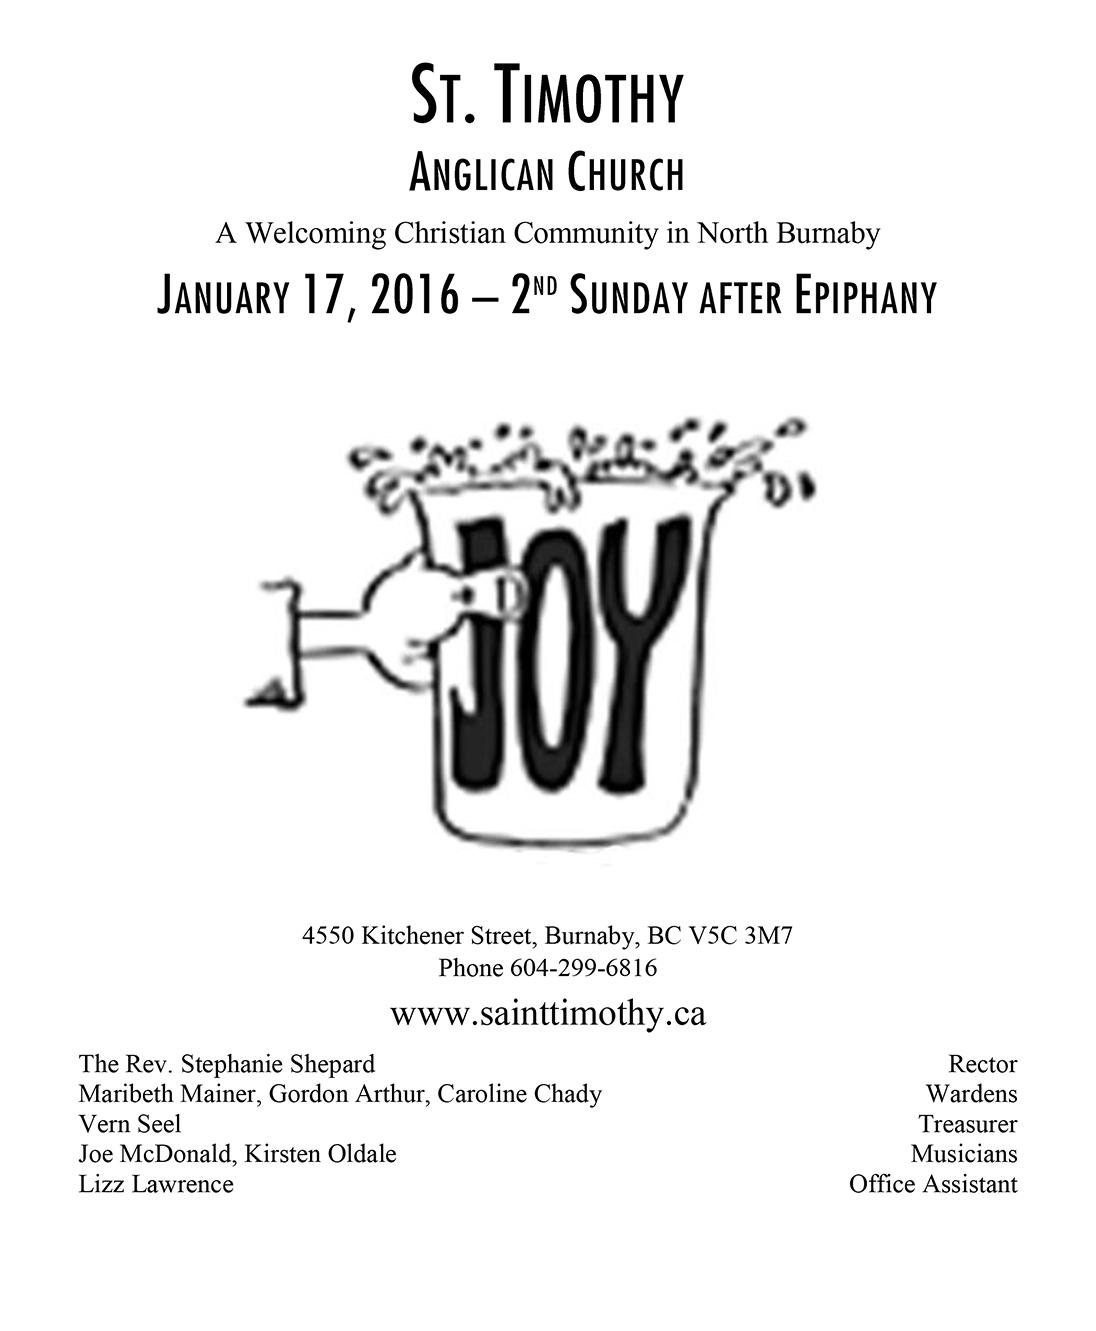 Bulletin: January 17, 2016